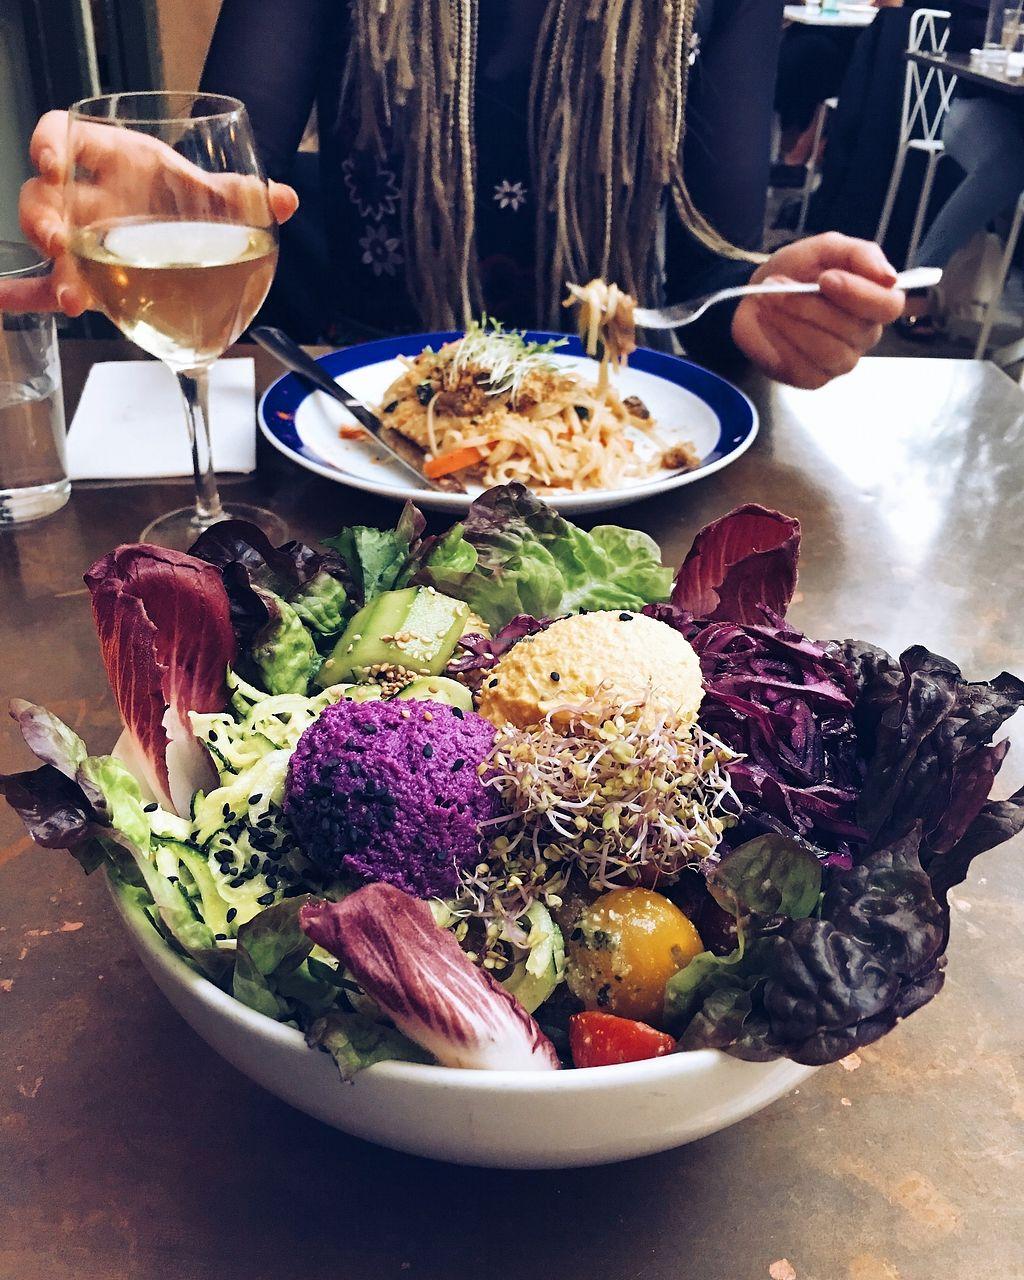 "Photo of Flax & Kale - Placa Castella  by <a href=""/members/profile/Sara_Aurora"">Sara_Aurora</a> <br/>Salad bowl. Yuuum! <br/> August 13, 2017  - <a href='/contact/abuse/image/53077/292415'>Report</a>"